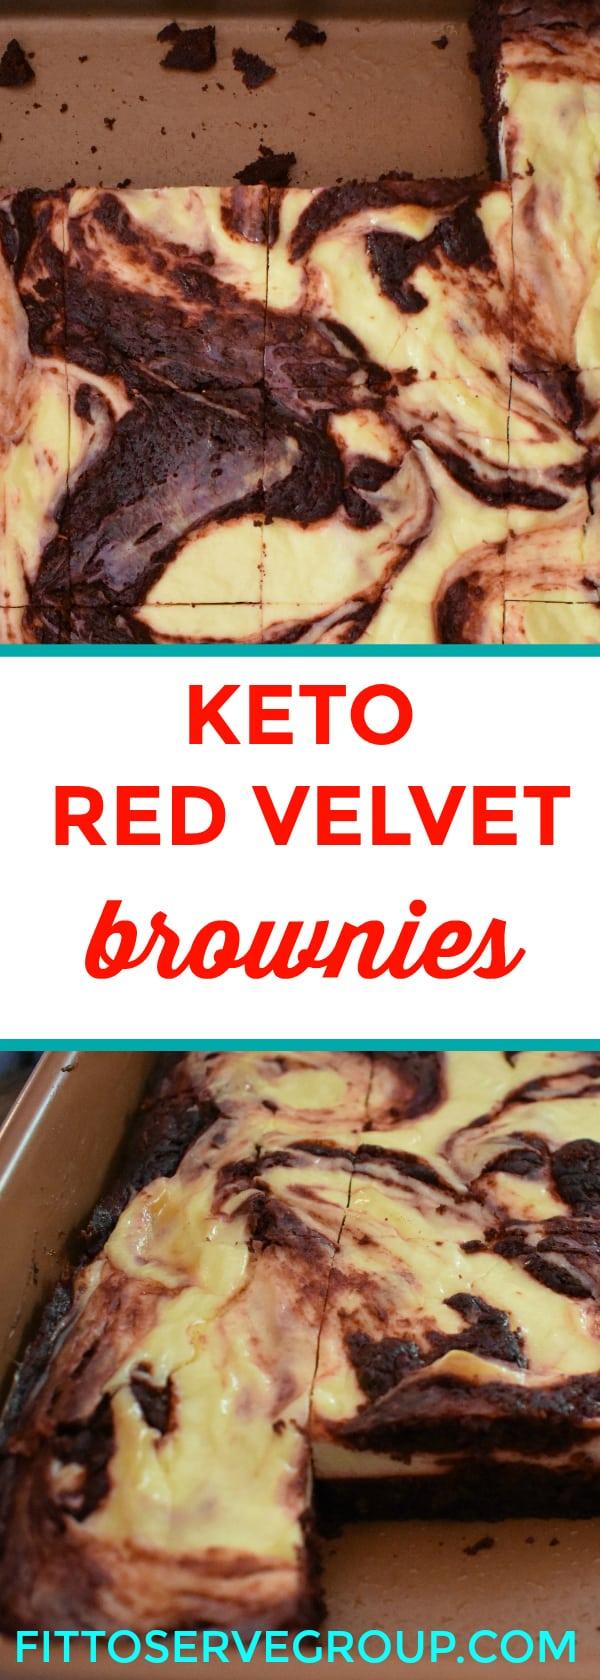 Keto red velvet cheesecake swirl brownies featuring the flavors of red velvet and cheesecake wrapped up in a low carb keto brownie